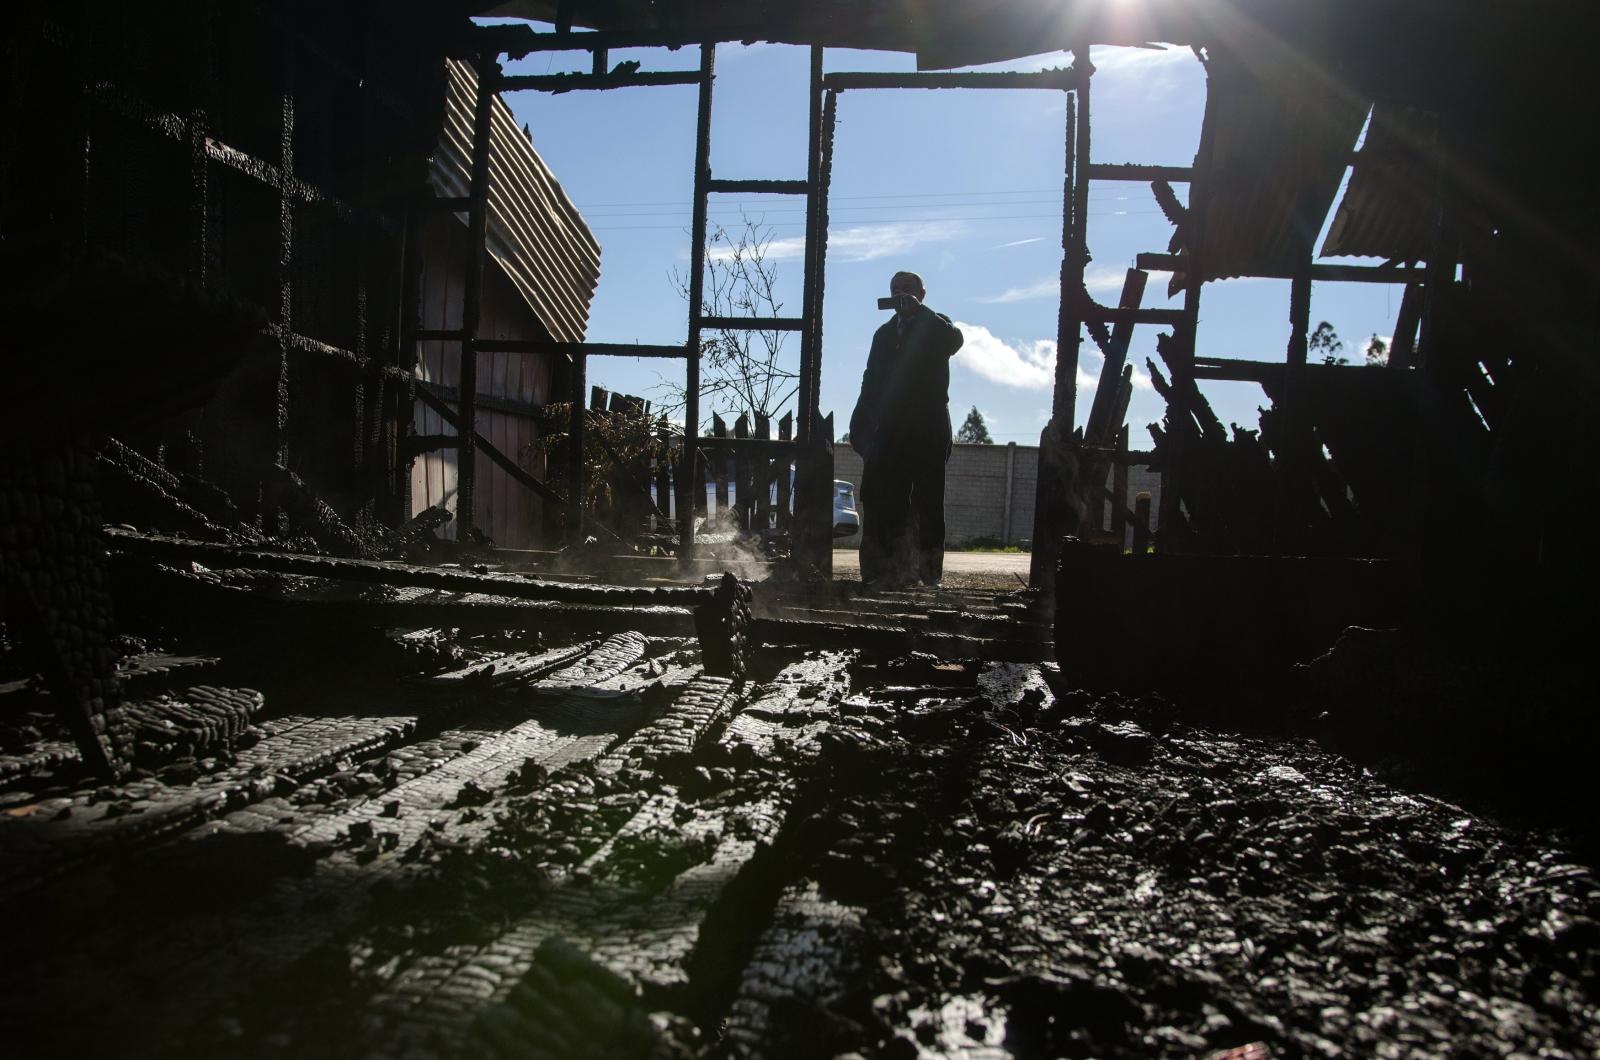 Kościół po ataku w Chile